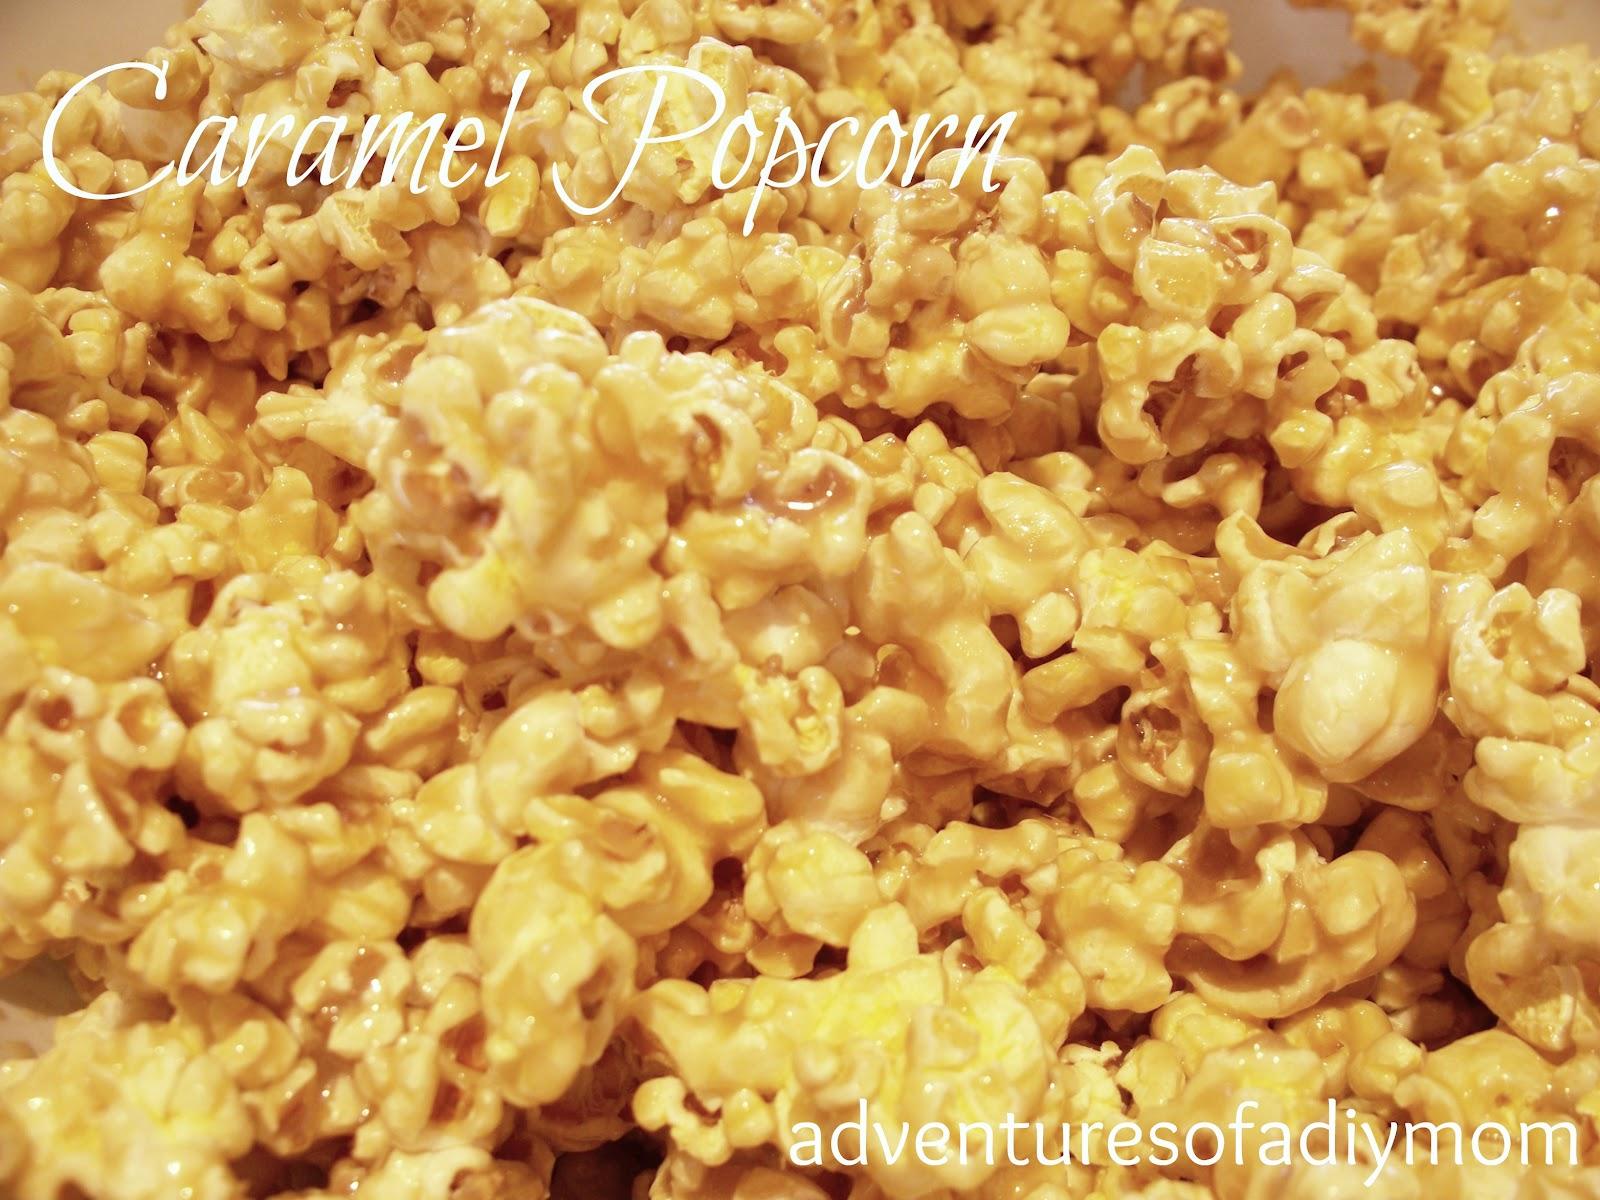 ... popcorn popcorn trail mix perfect popcorn snack recipe salted caramel